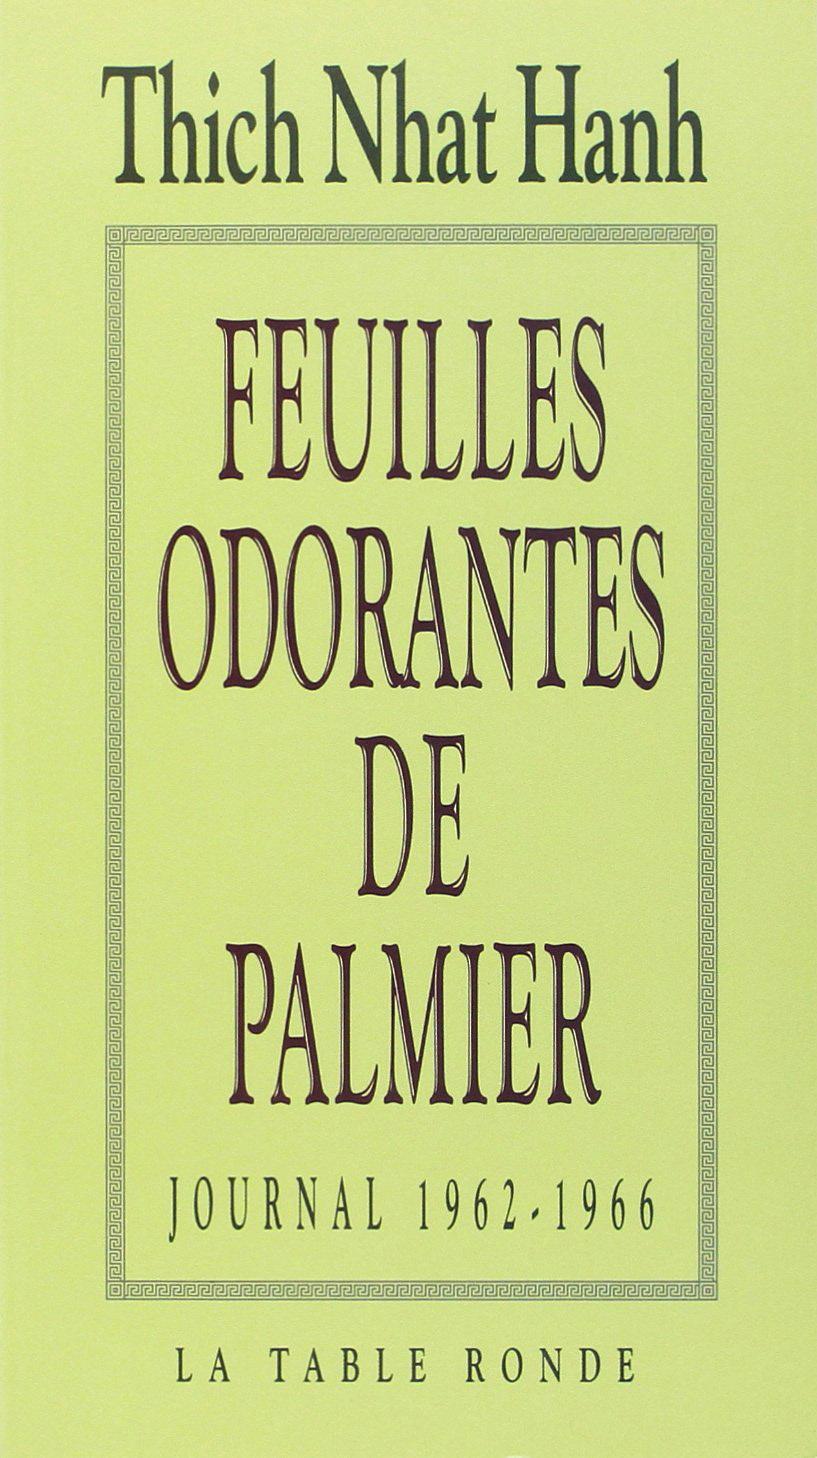 FEUILLES ODORANTES DE PALMIER - JOURNAL 1962-1966